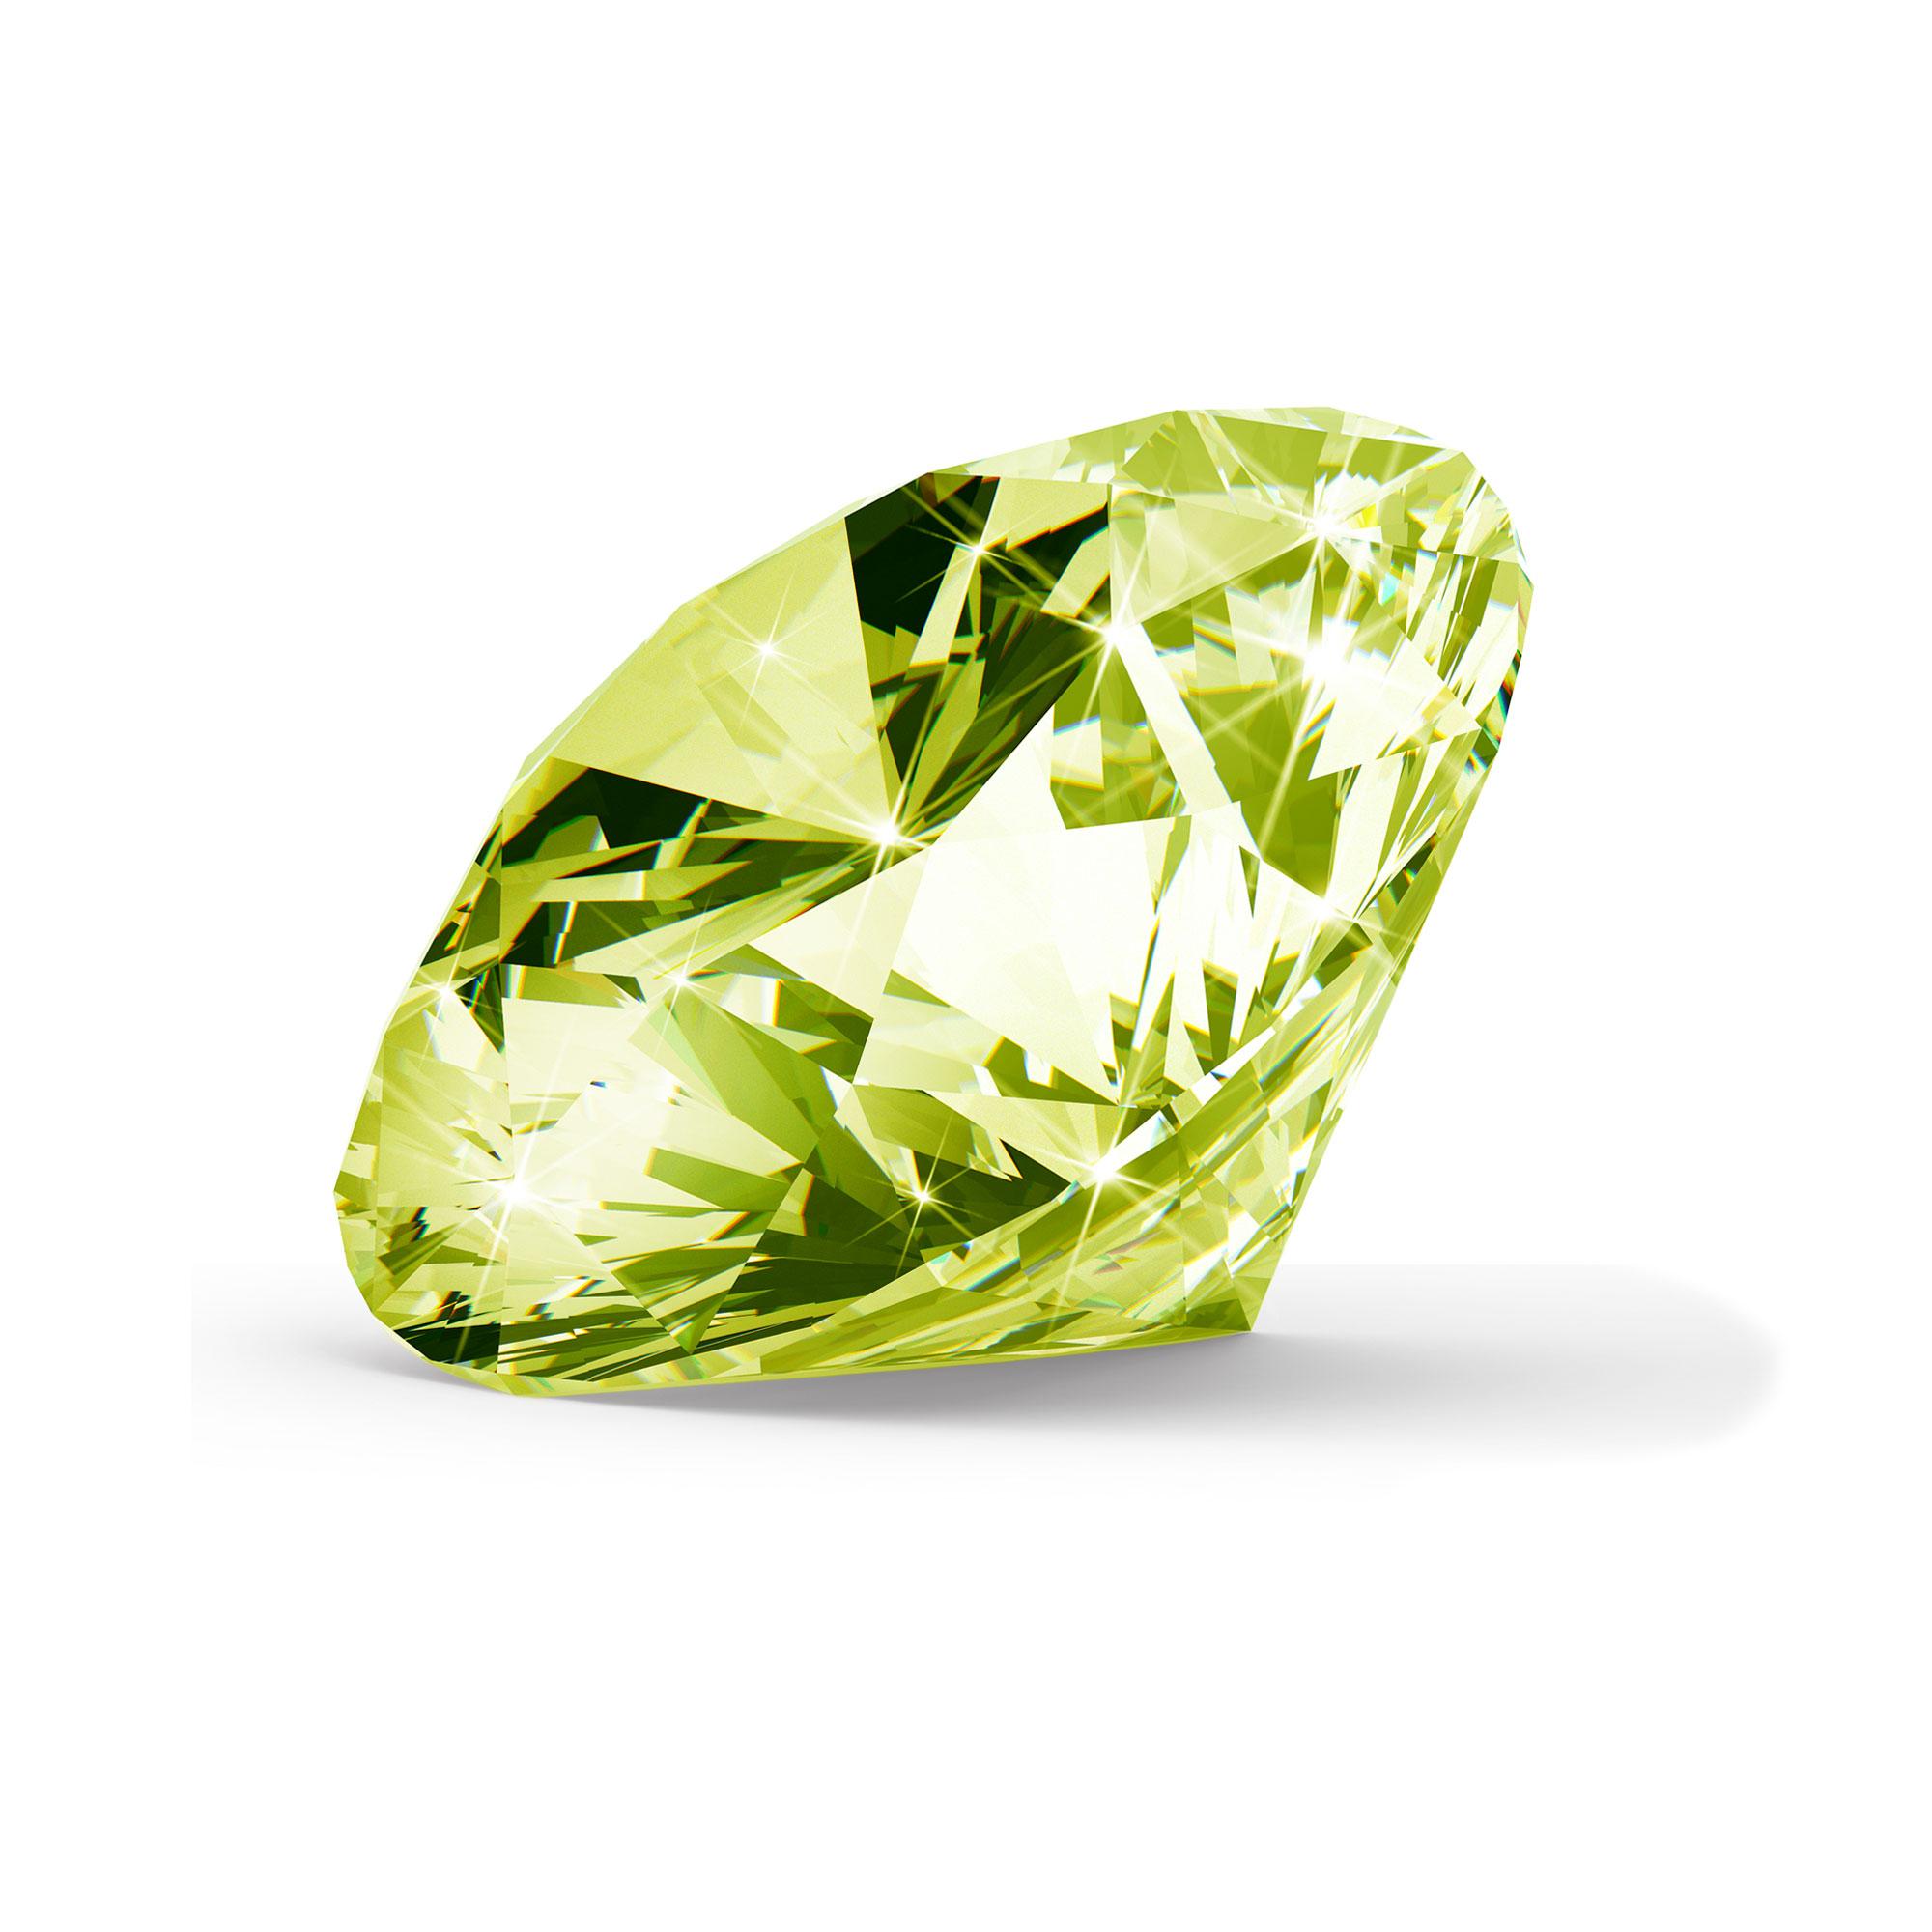 Grøn/gul diamant brilliant round cut fra siden